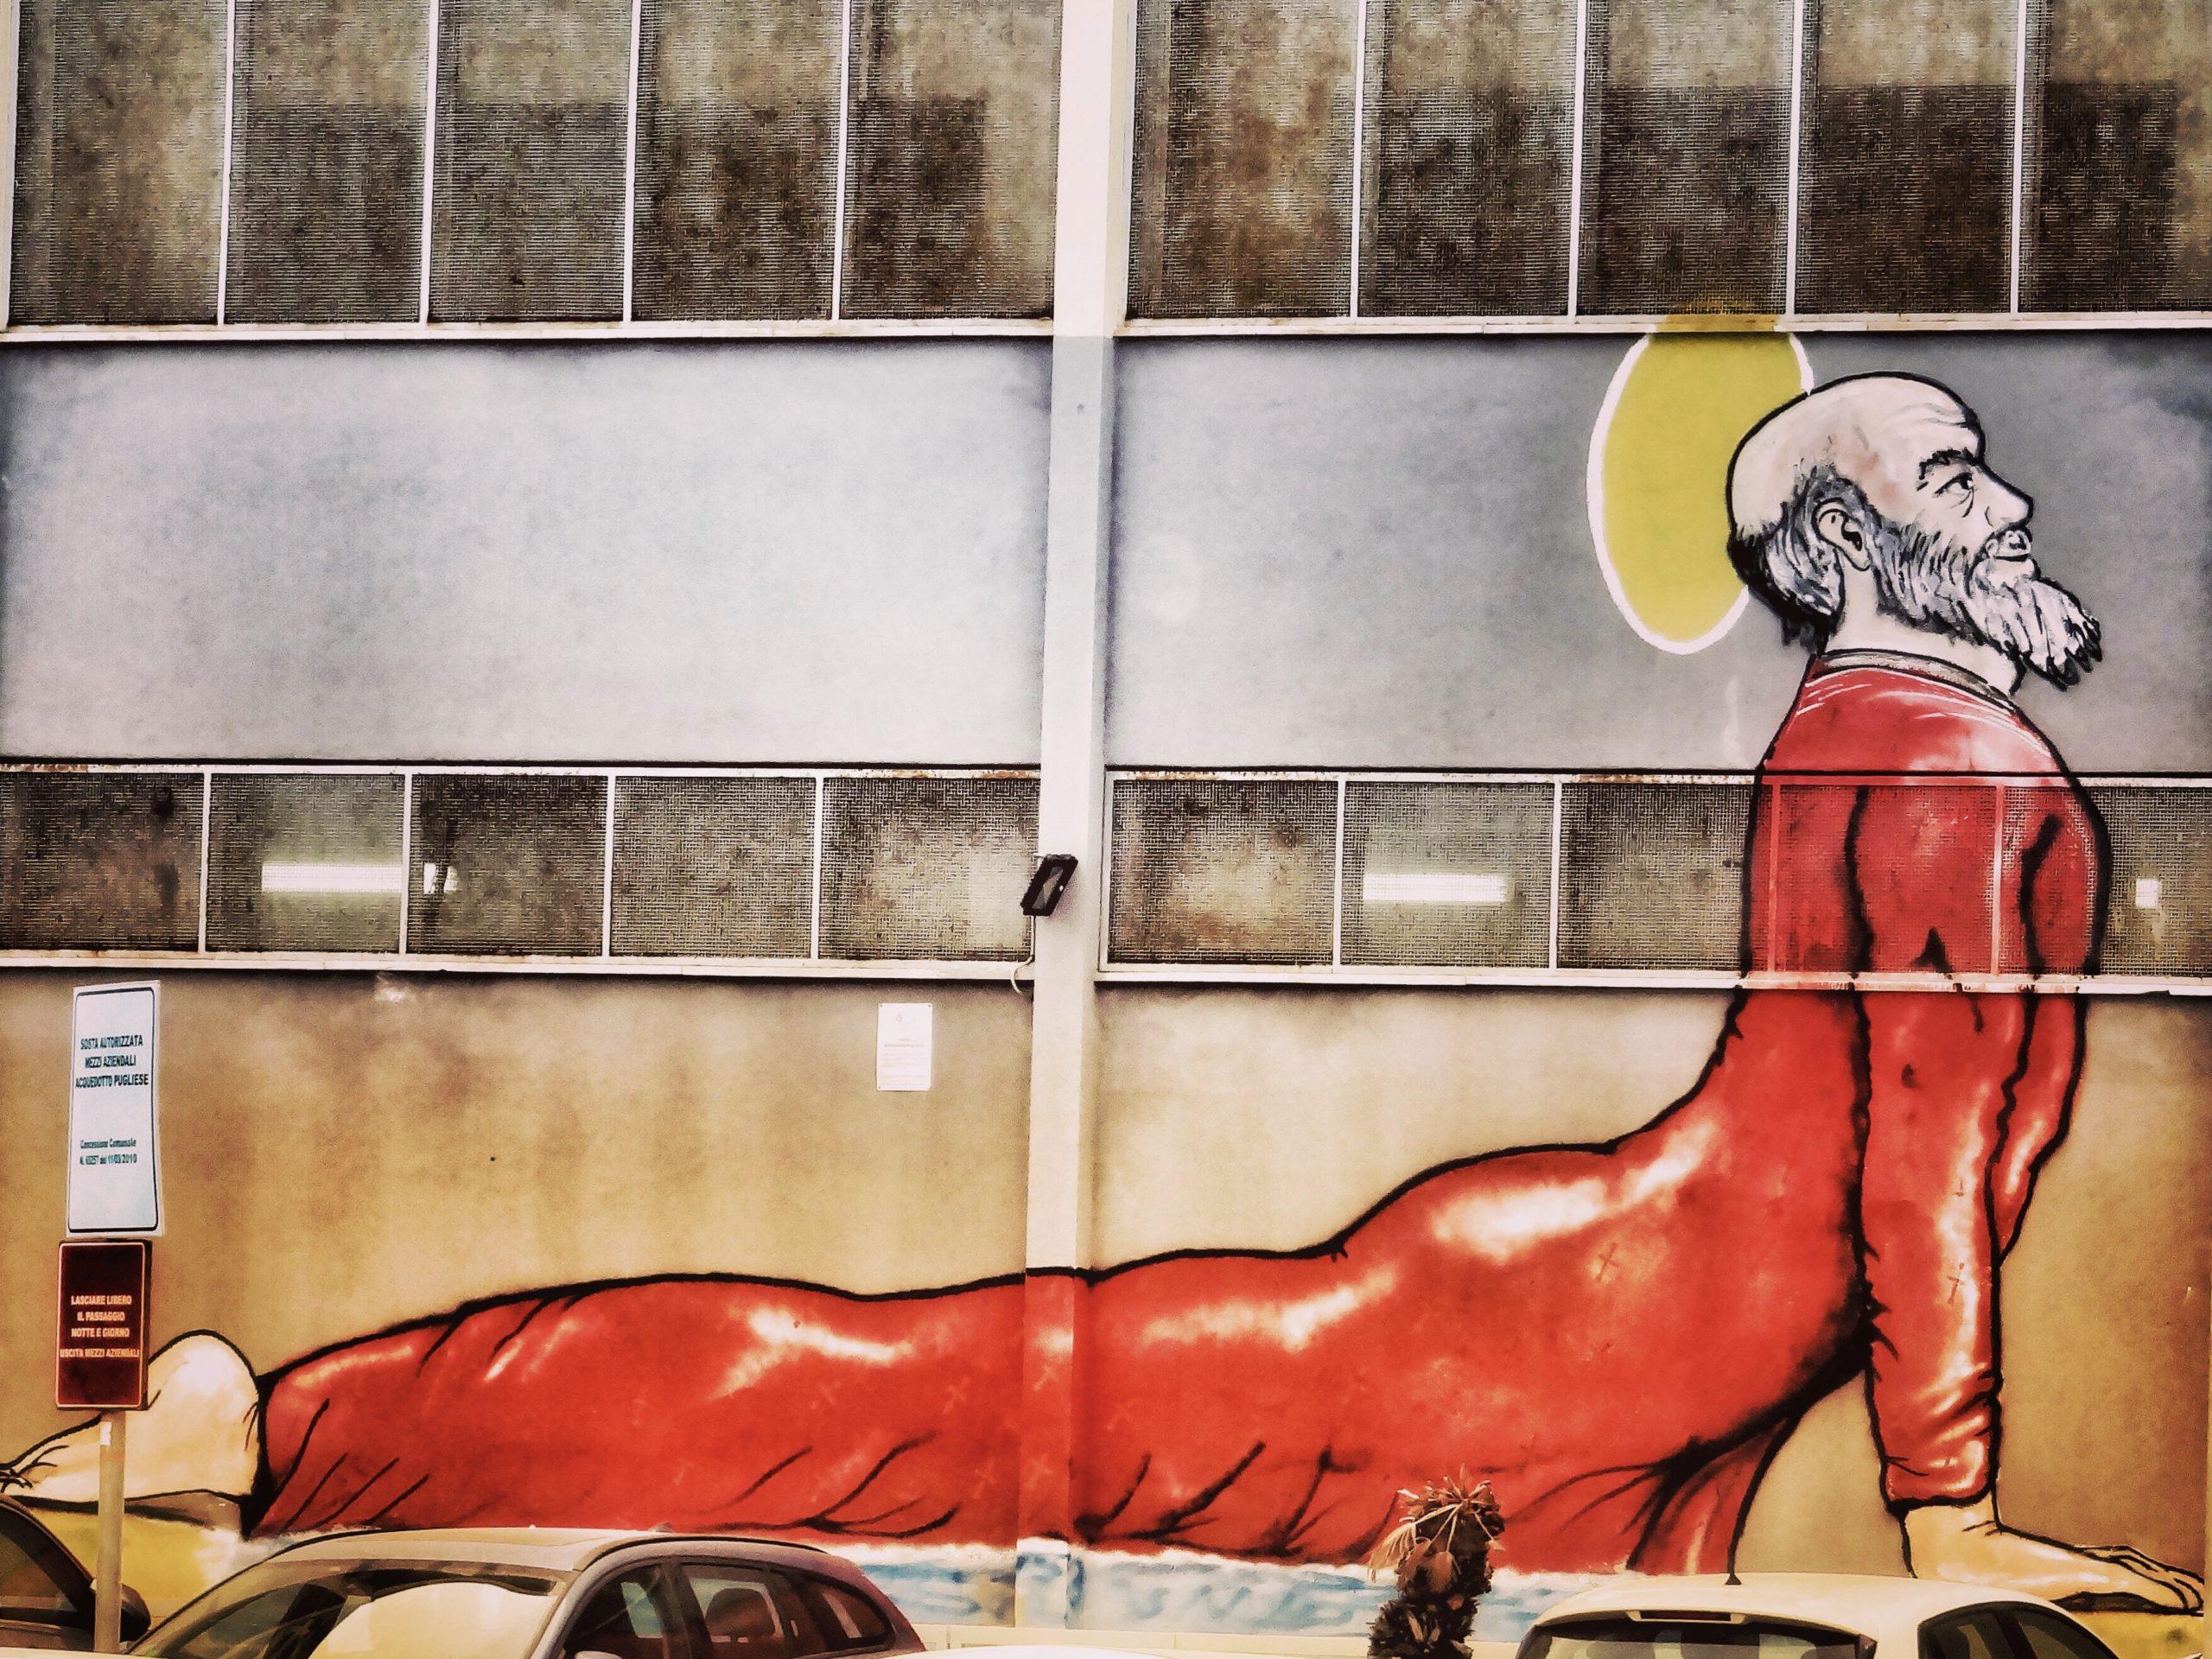 San Nicola Bari street art - the Saint Nicholas festival is one of Bari's biggest events